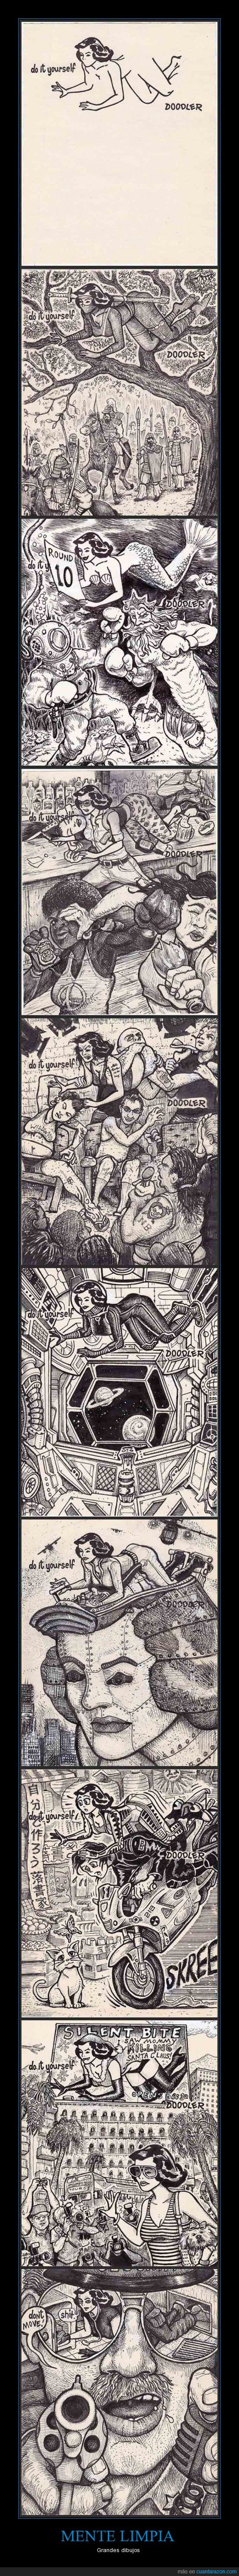 dibujo,erotico,ninja,robo,robot gigante,sirena